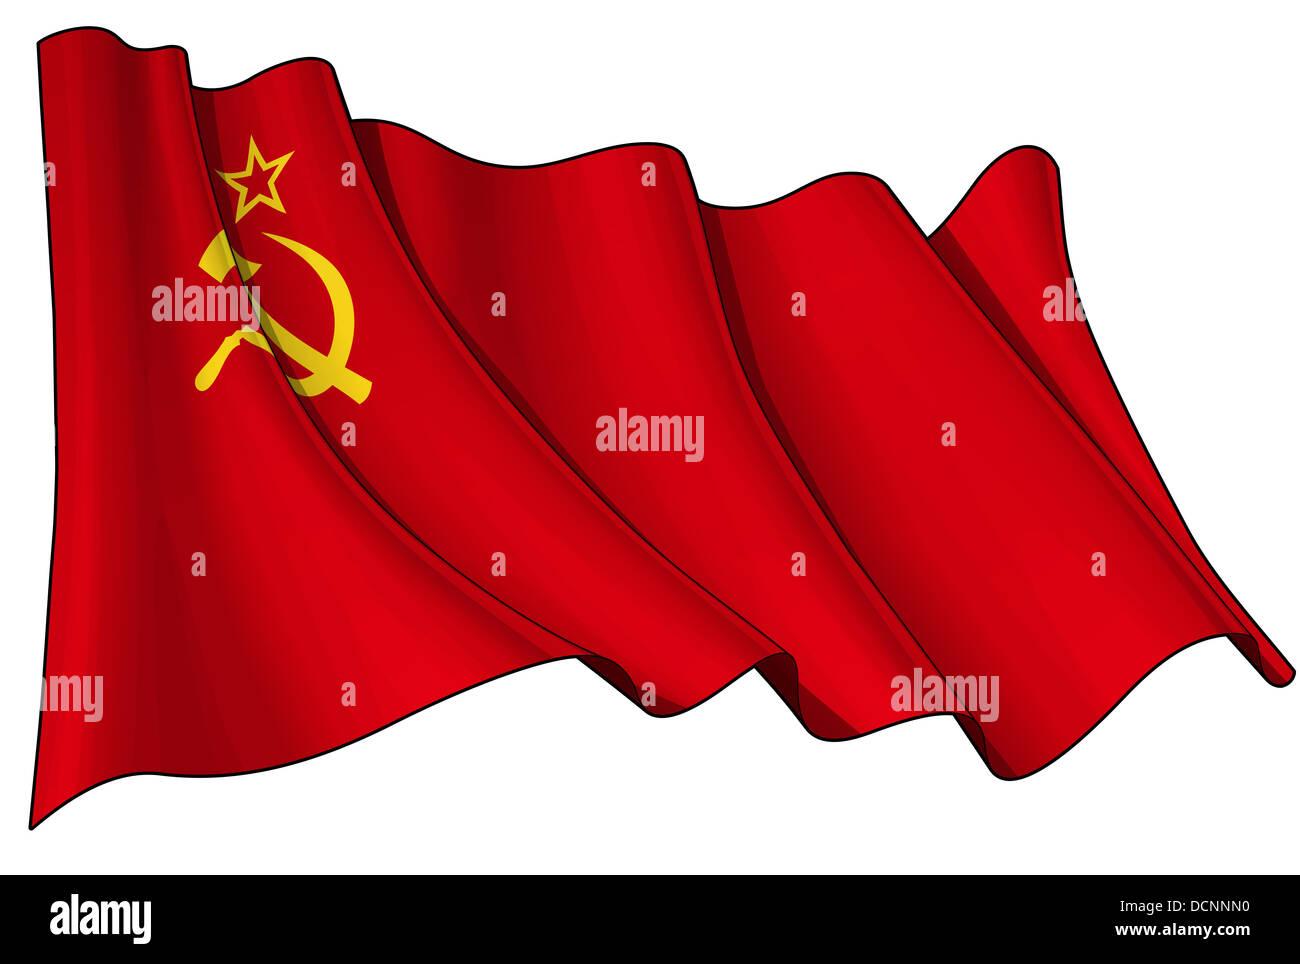 Soviet Union flag - Stock Image